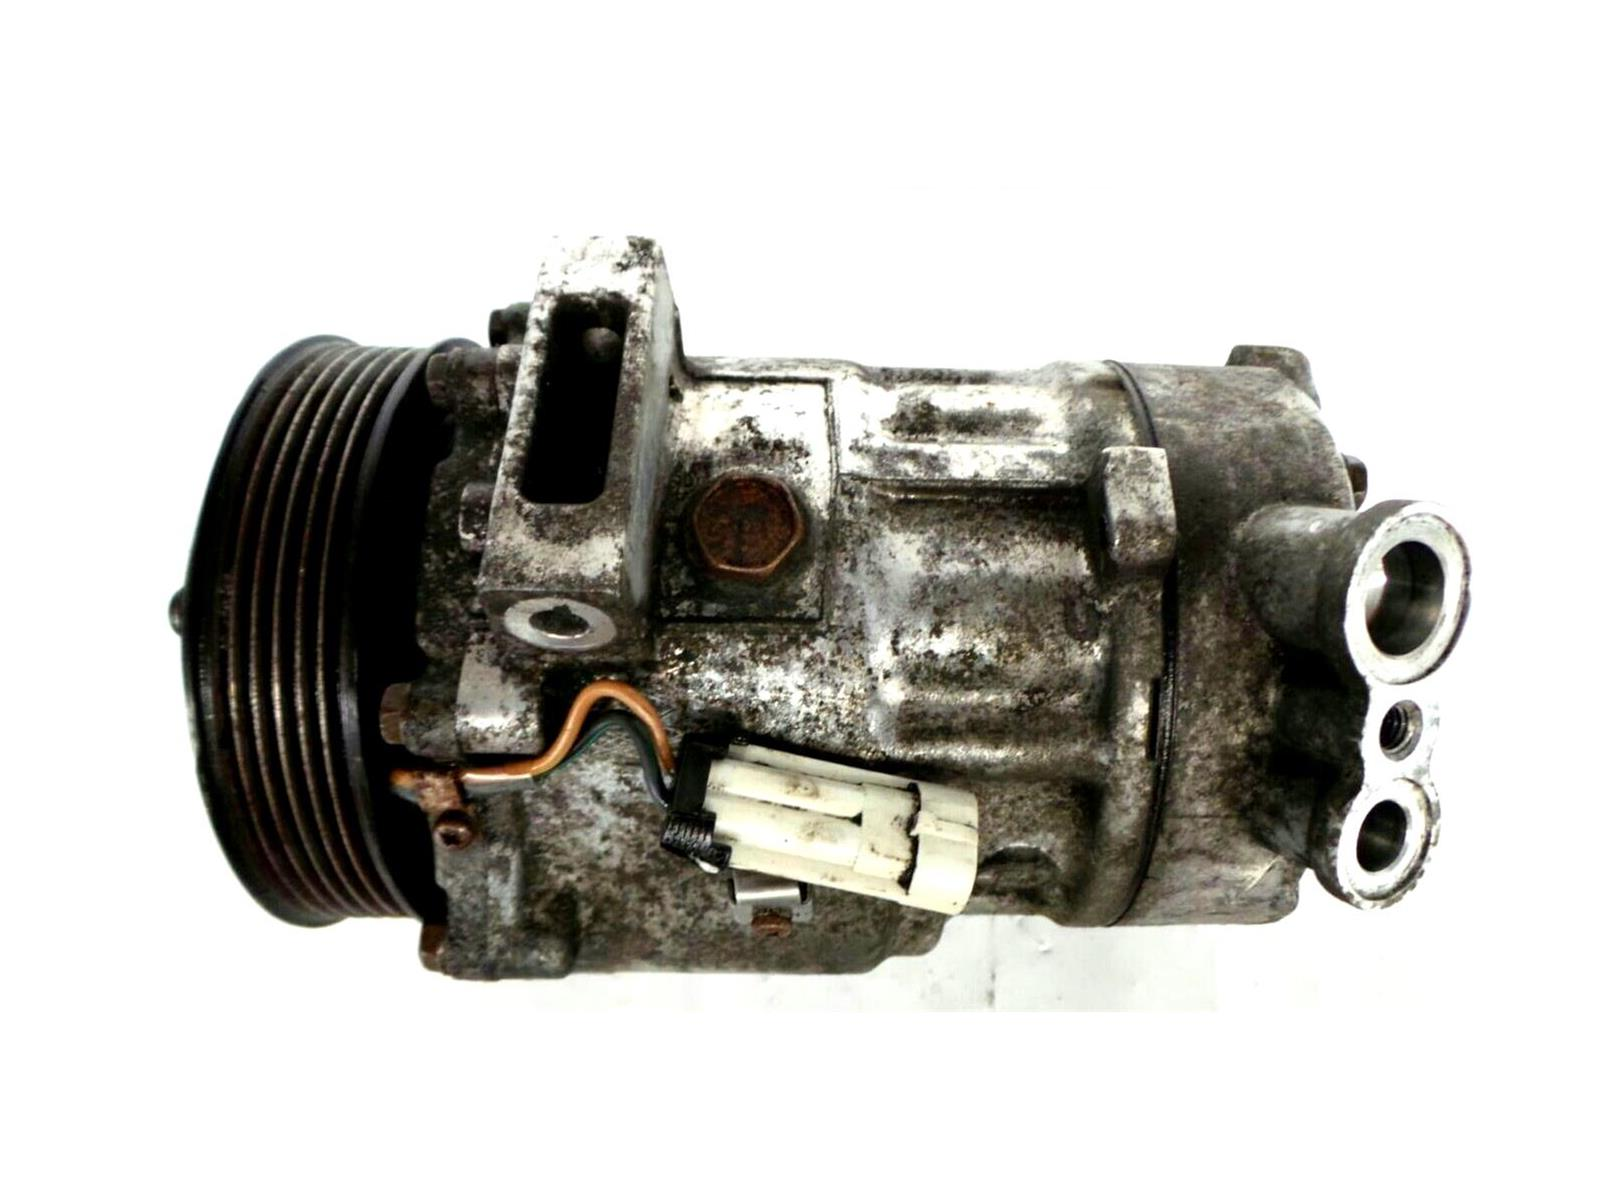 Saab 93 2003 To 2007 Air Conditioning Compressor Diesel Manual 9 3 Engine Diagram Ac Pump 07 19 Z19dt Con